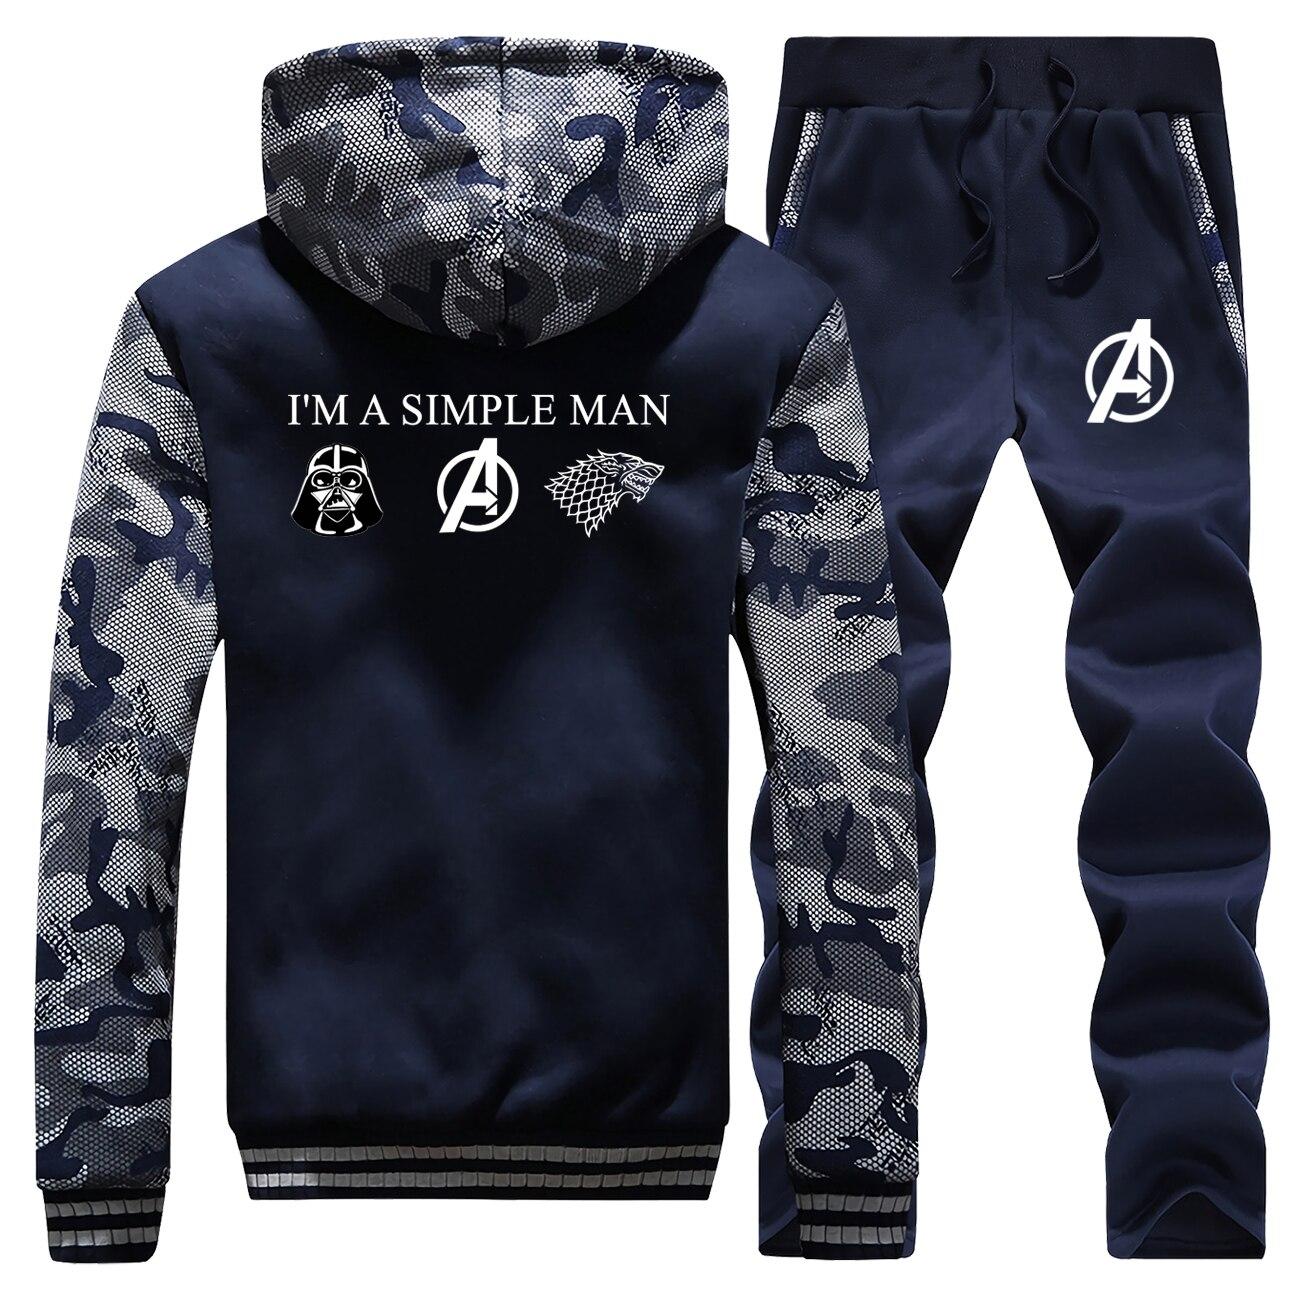 Game Of Thrones Star Wars The Avengers Hoodies Pant Set Men Tracksuit Coat Track Suit Winter Thick Fleece Jacket Camo 2 PCS Sets